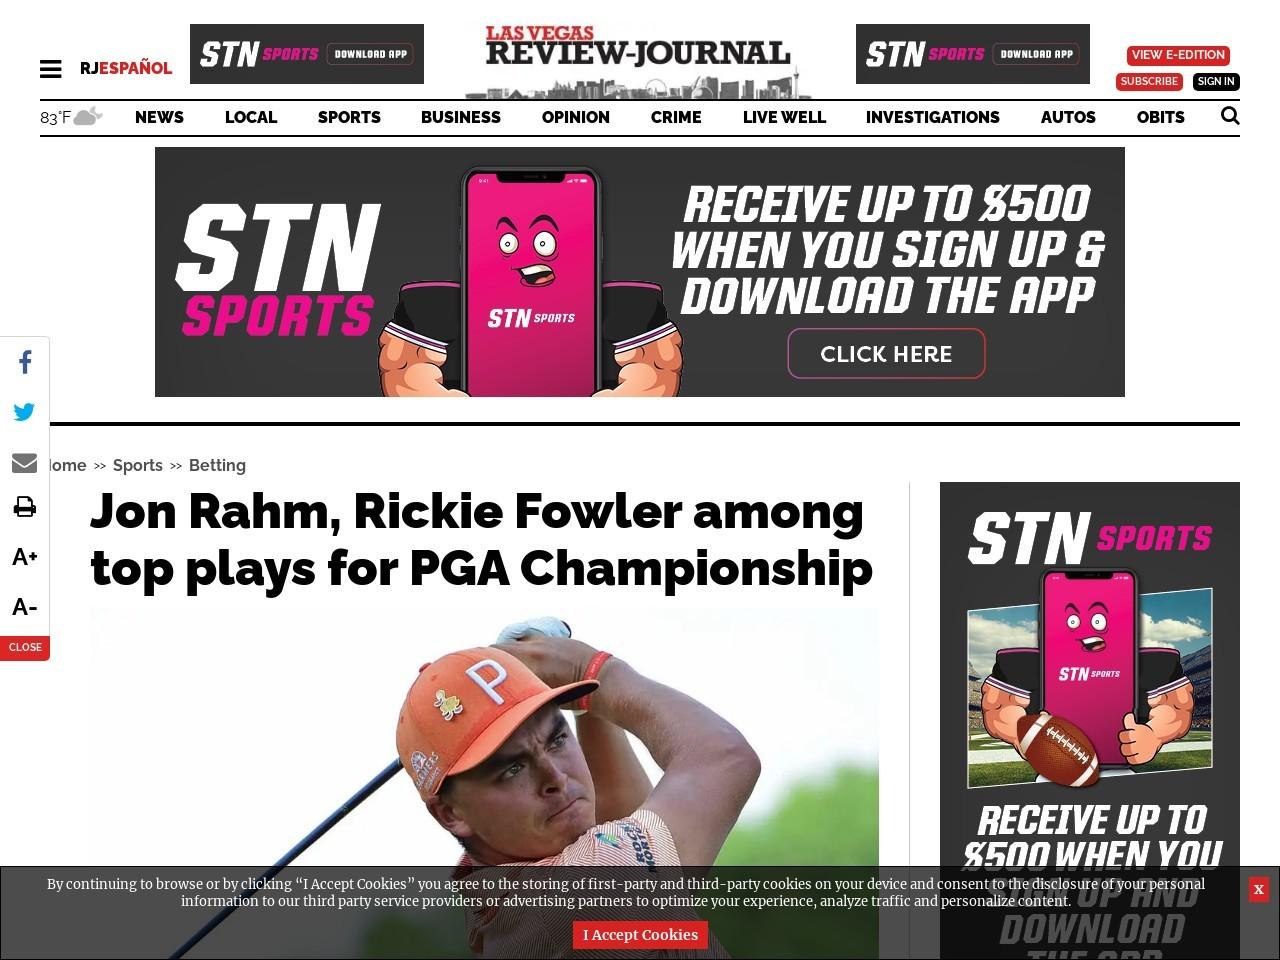 Jon Rahm, Rickie Fowler among top plays for PGA Championship